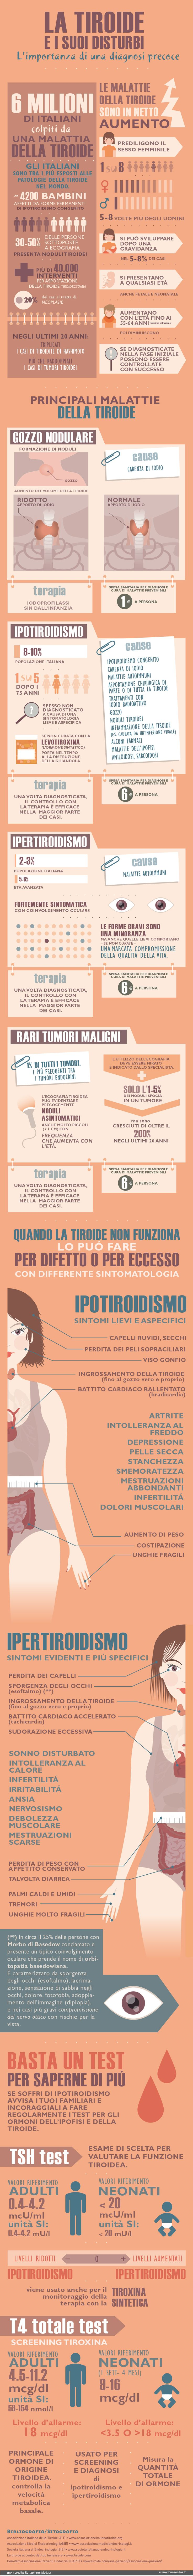 LA TIROIDE E I SUOI DISTURBI- Infografica Esseredonnaonline